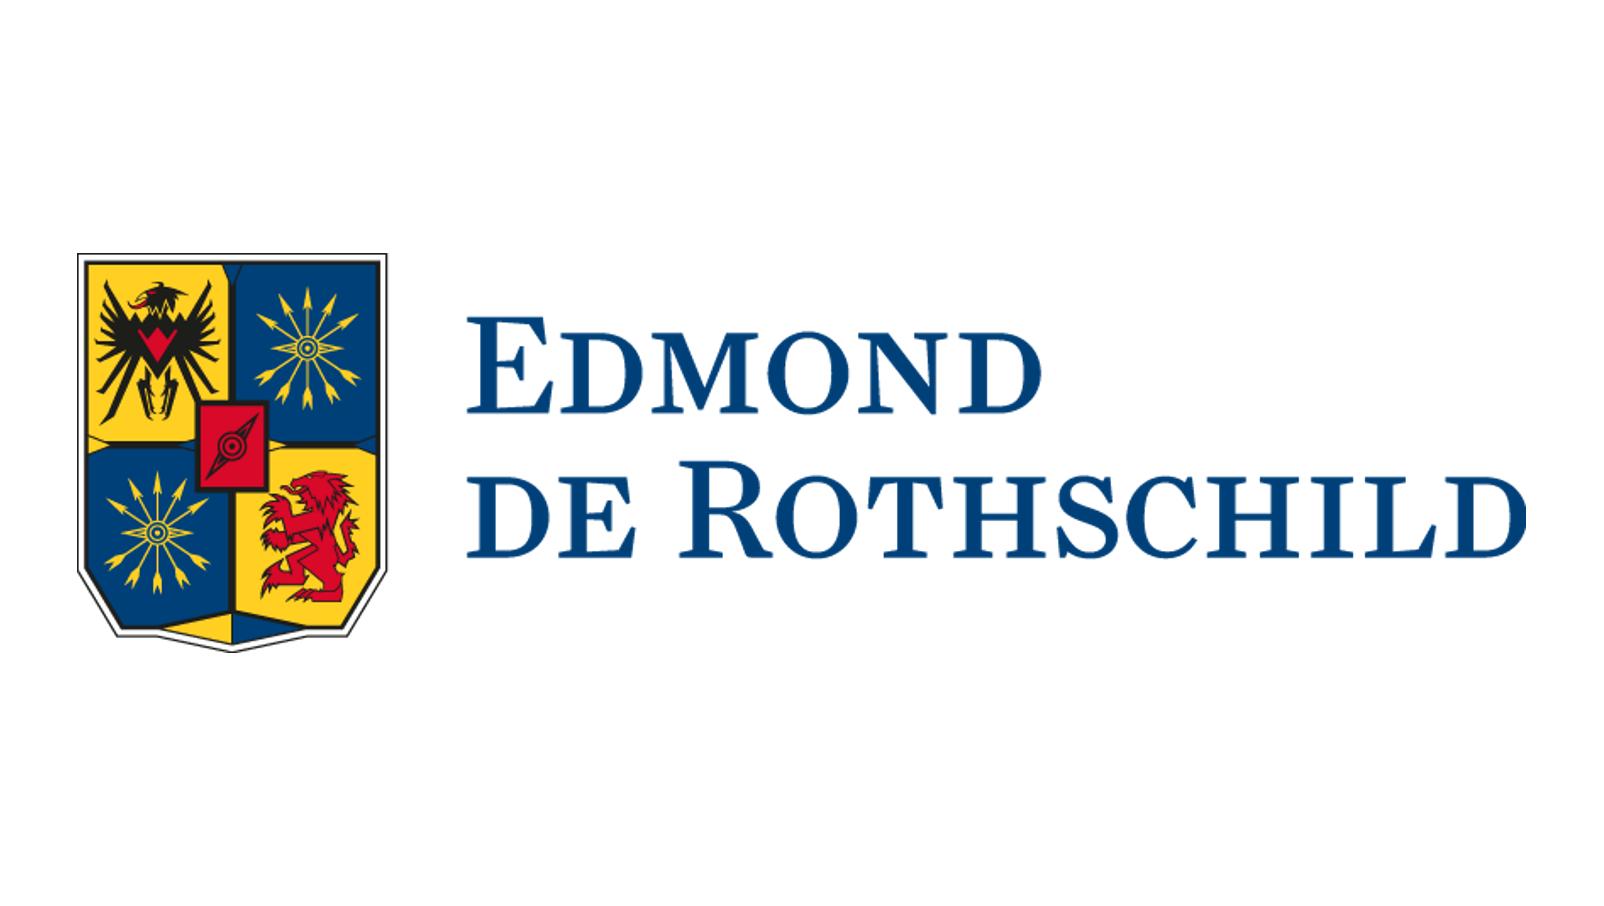 Edmond de Rothschild - Investment partners